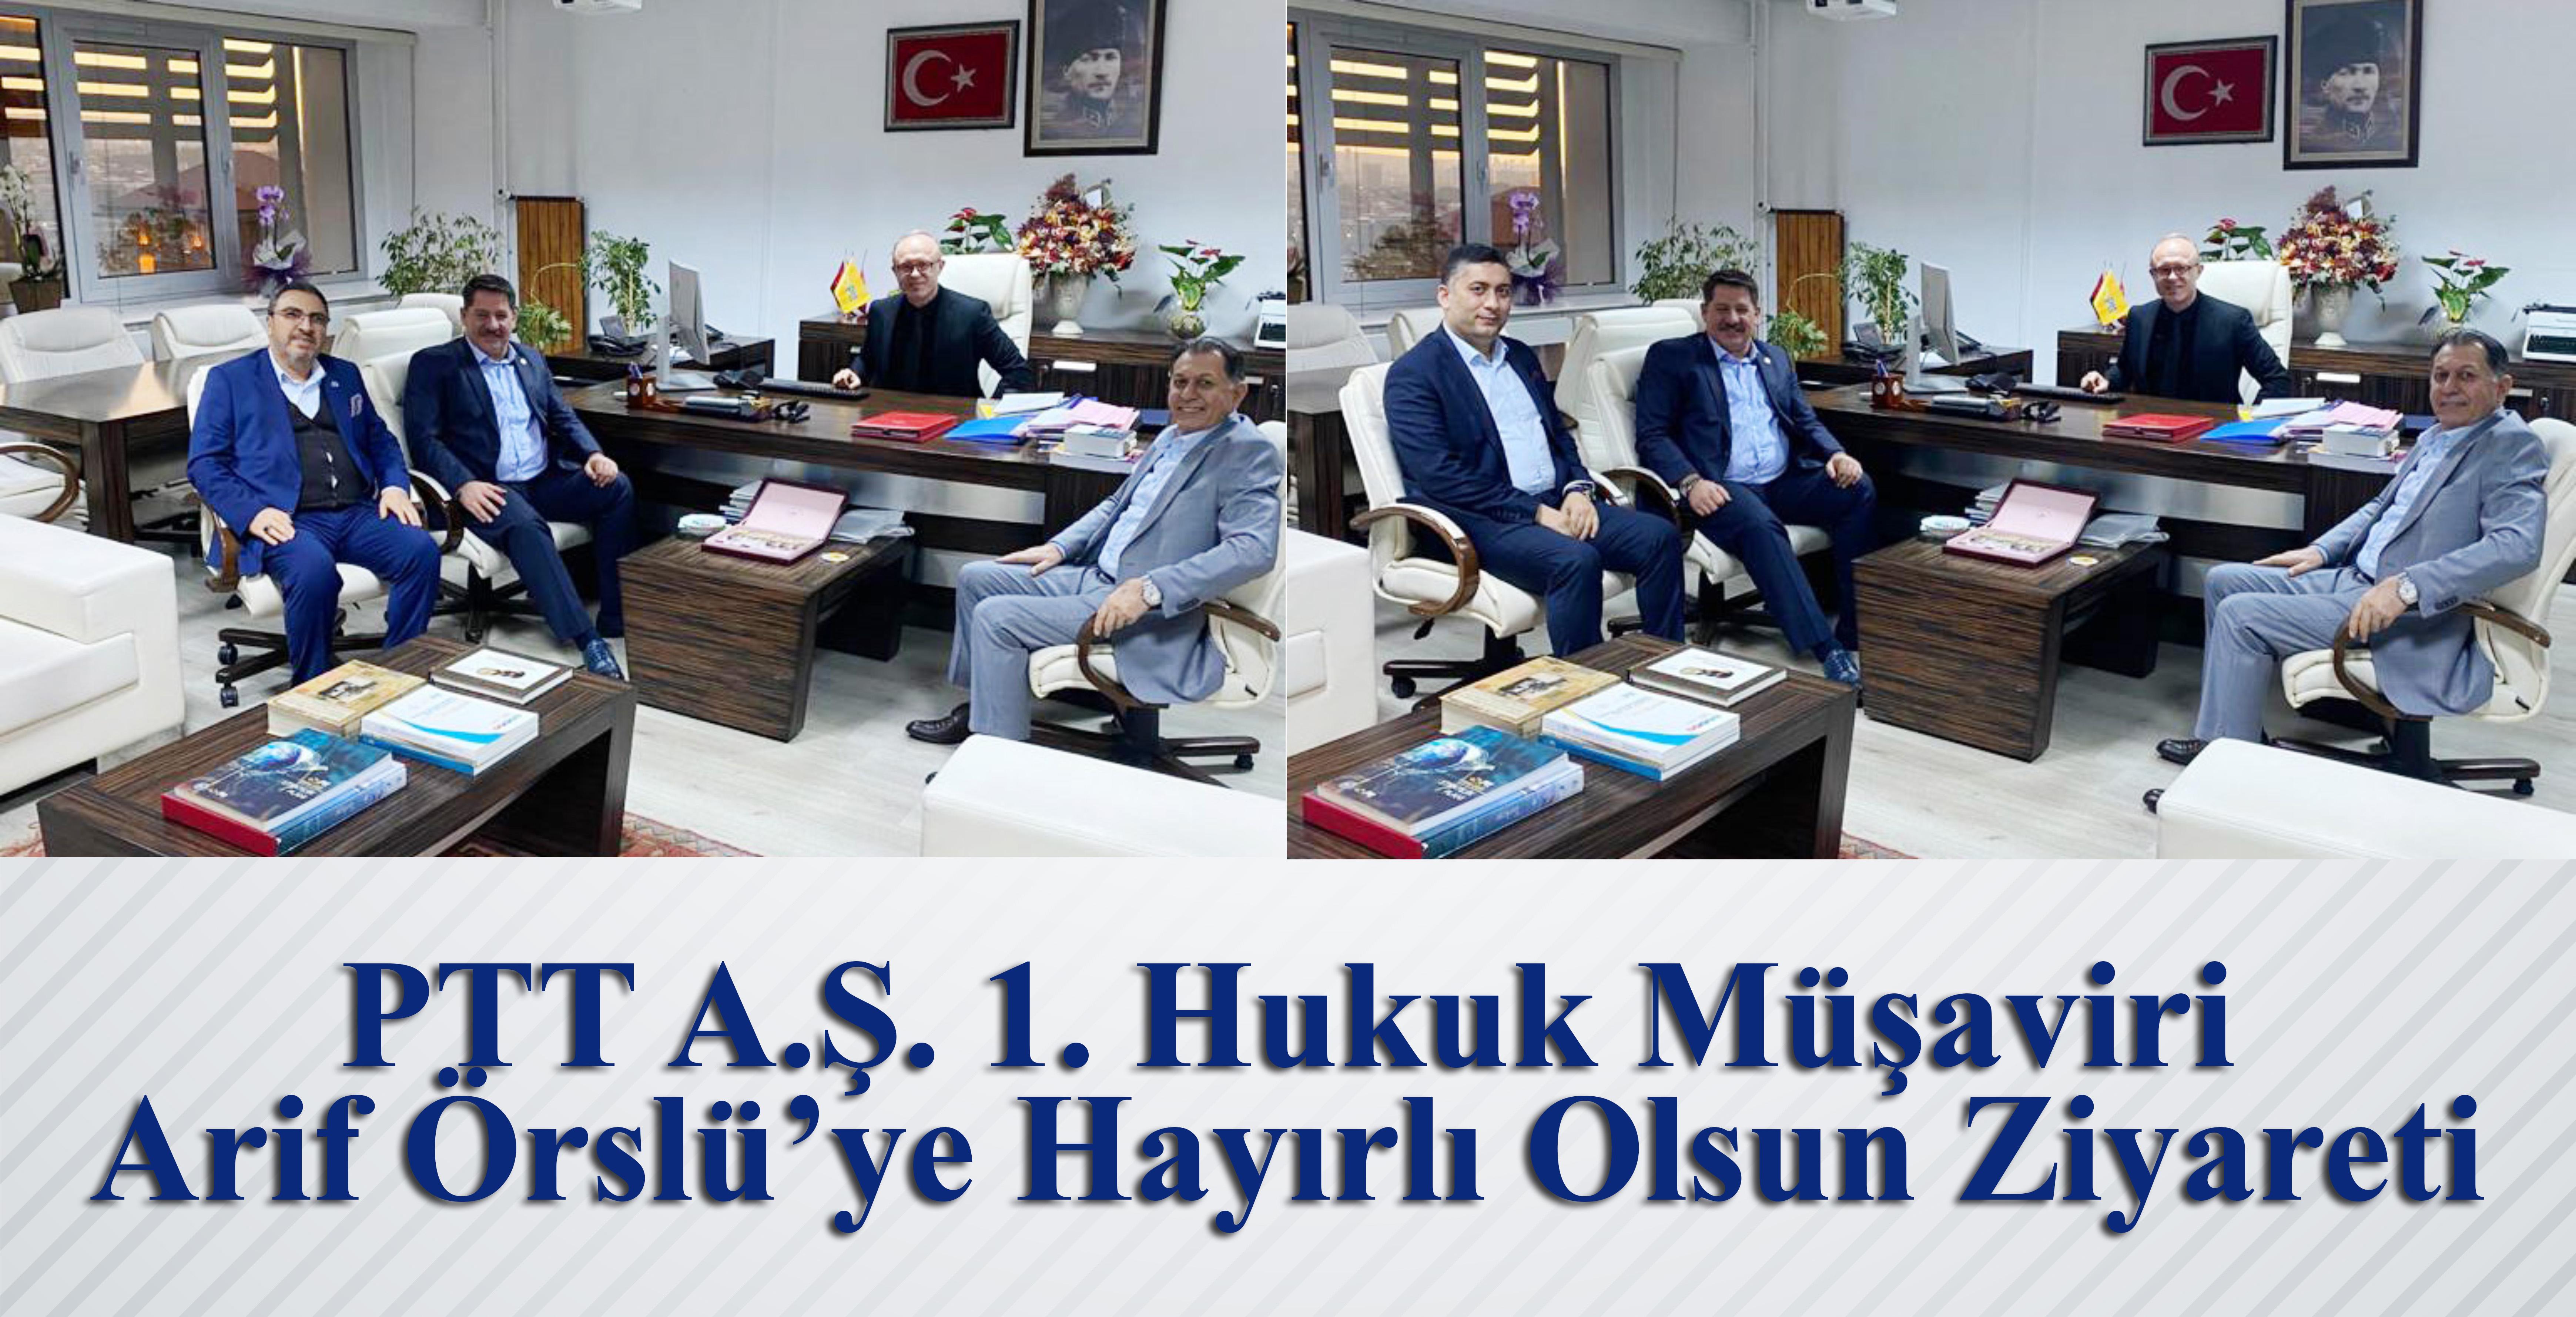 PTT A.Ş. 1. Hukuk Müşaviri Arif Örslü'ye Hayırlı Olsun Ziyareti